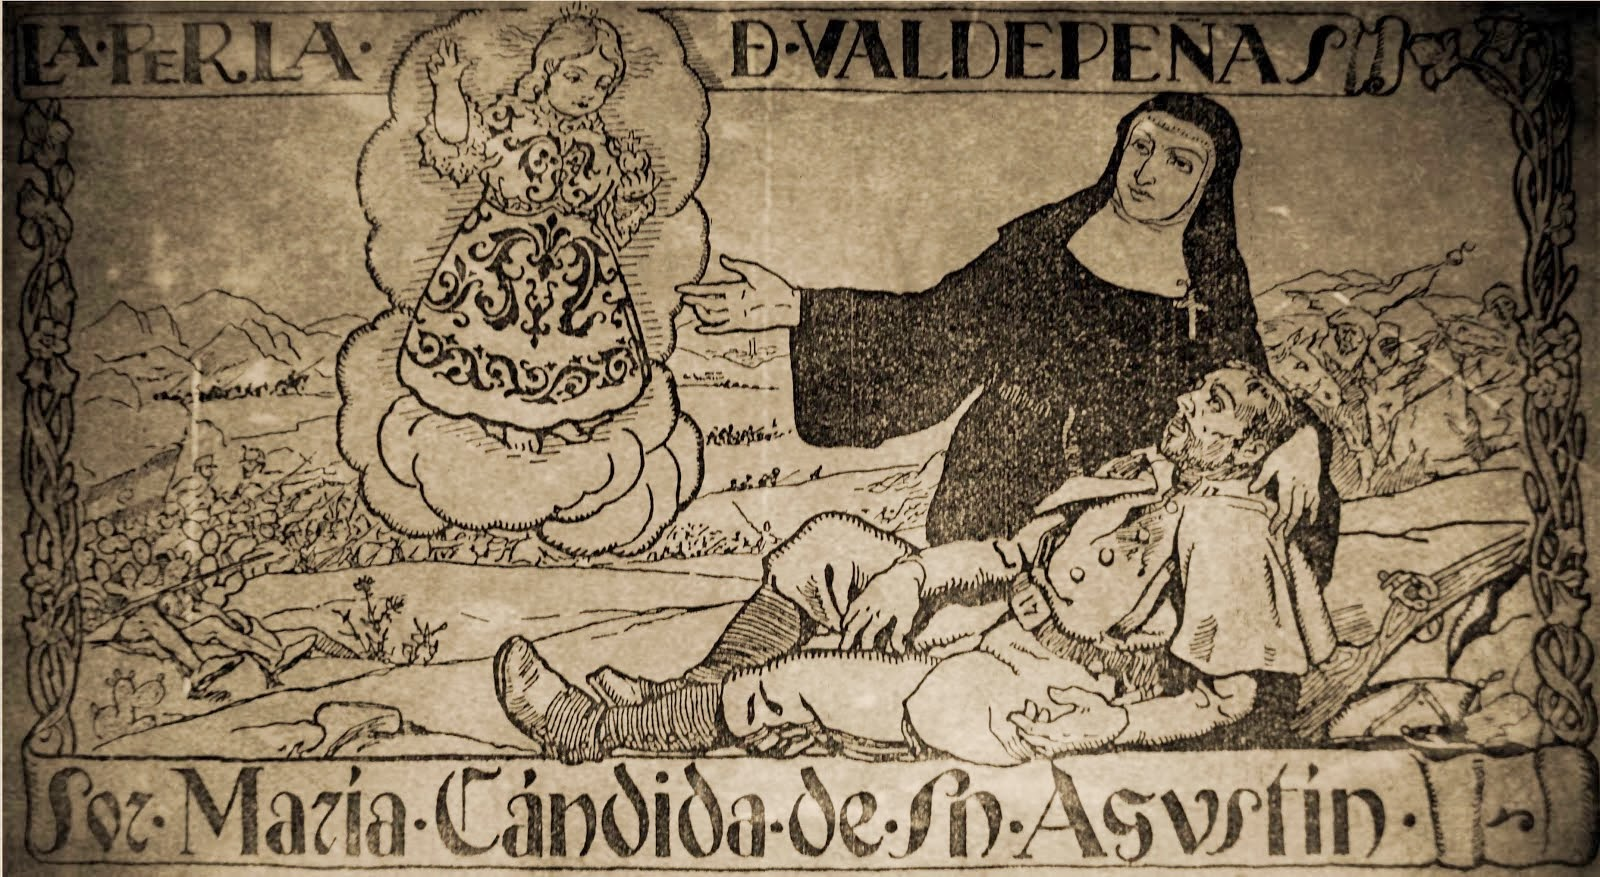 MADRE CANDIDA